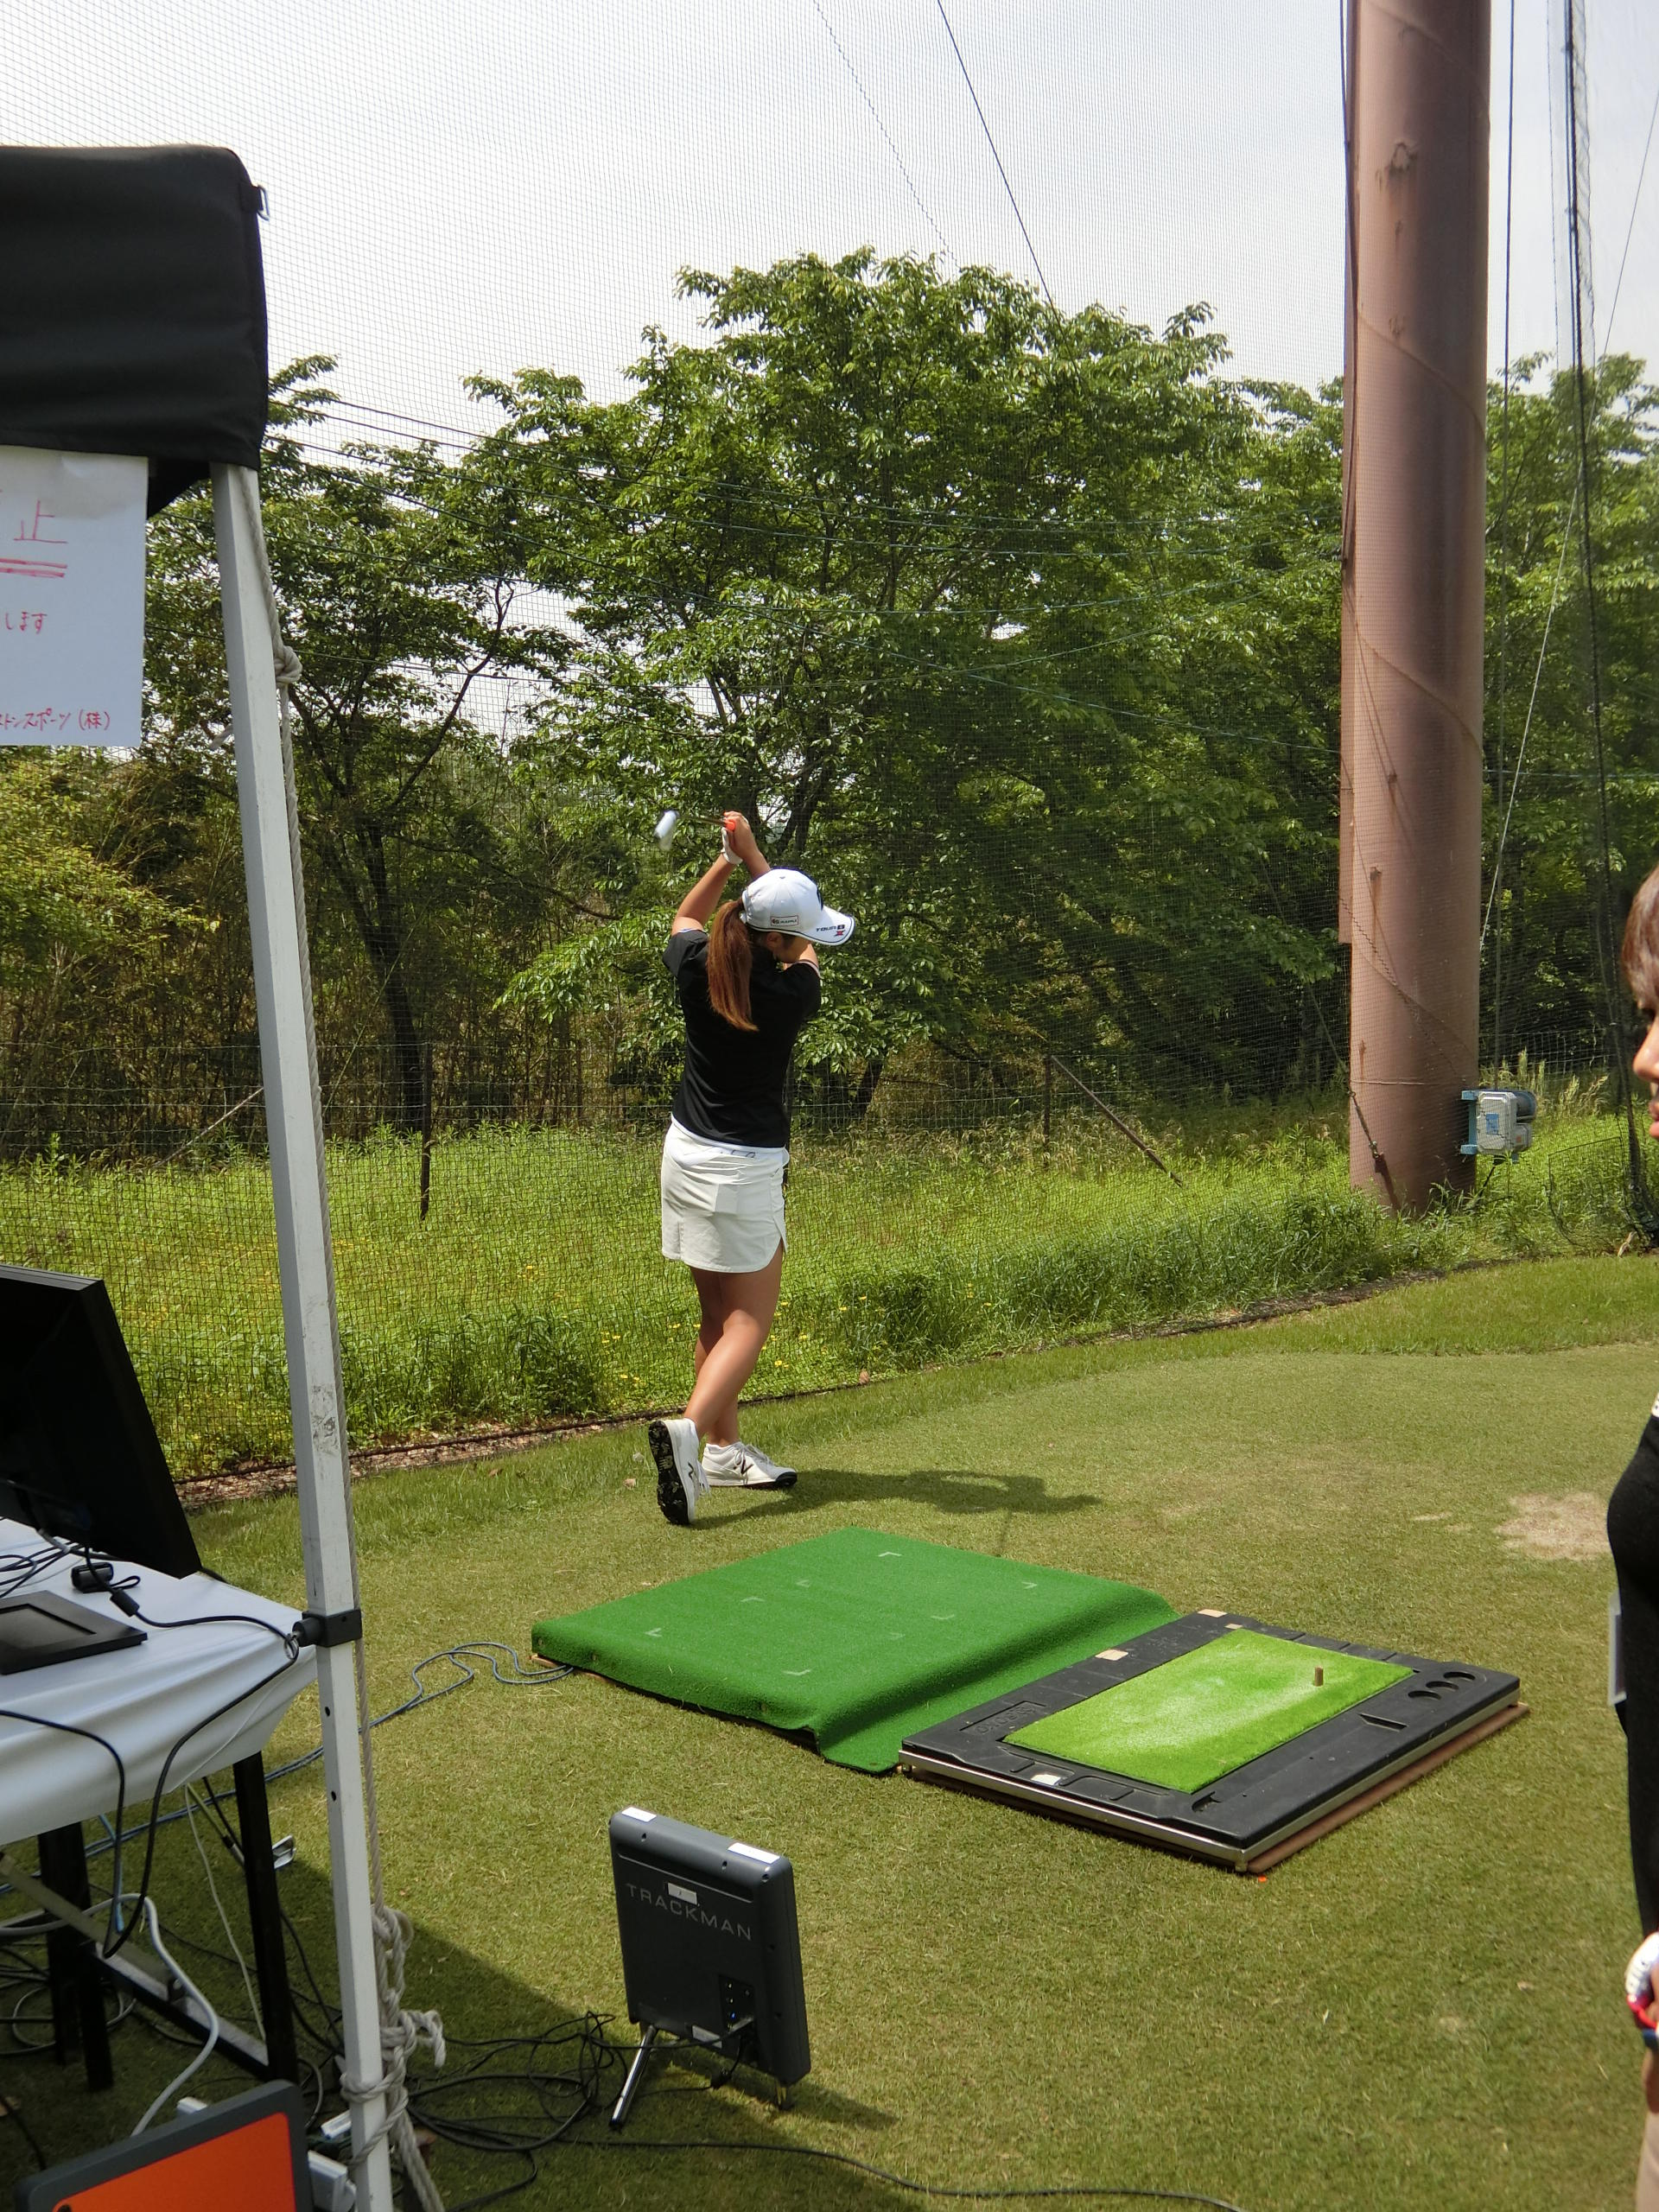 http://www.bs-golf.com/pro/09166fb58b9abe0518520f4f8e58c52b471563c7.JPG